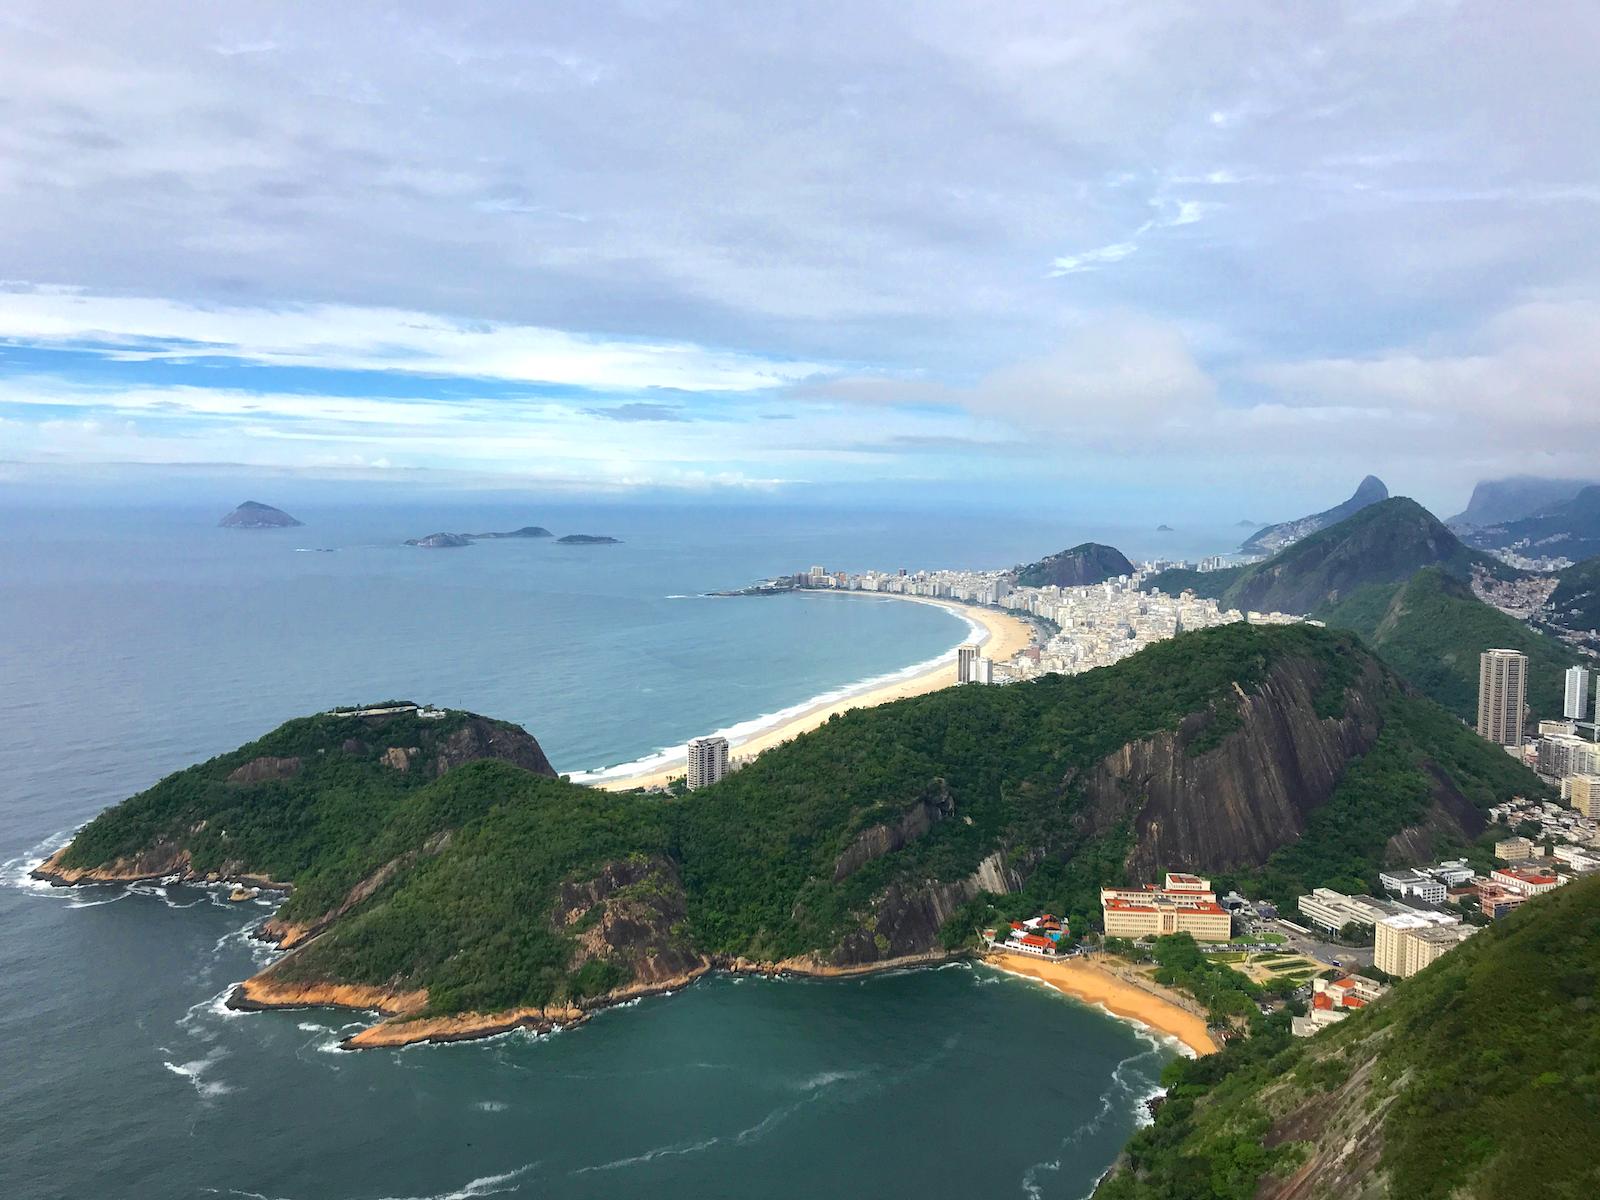 tourameo-reiseplanung-individualreise-brasilien-rio-de-janeiro-zuckerhut-copacabana